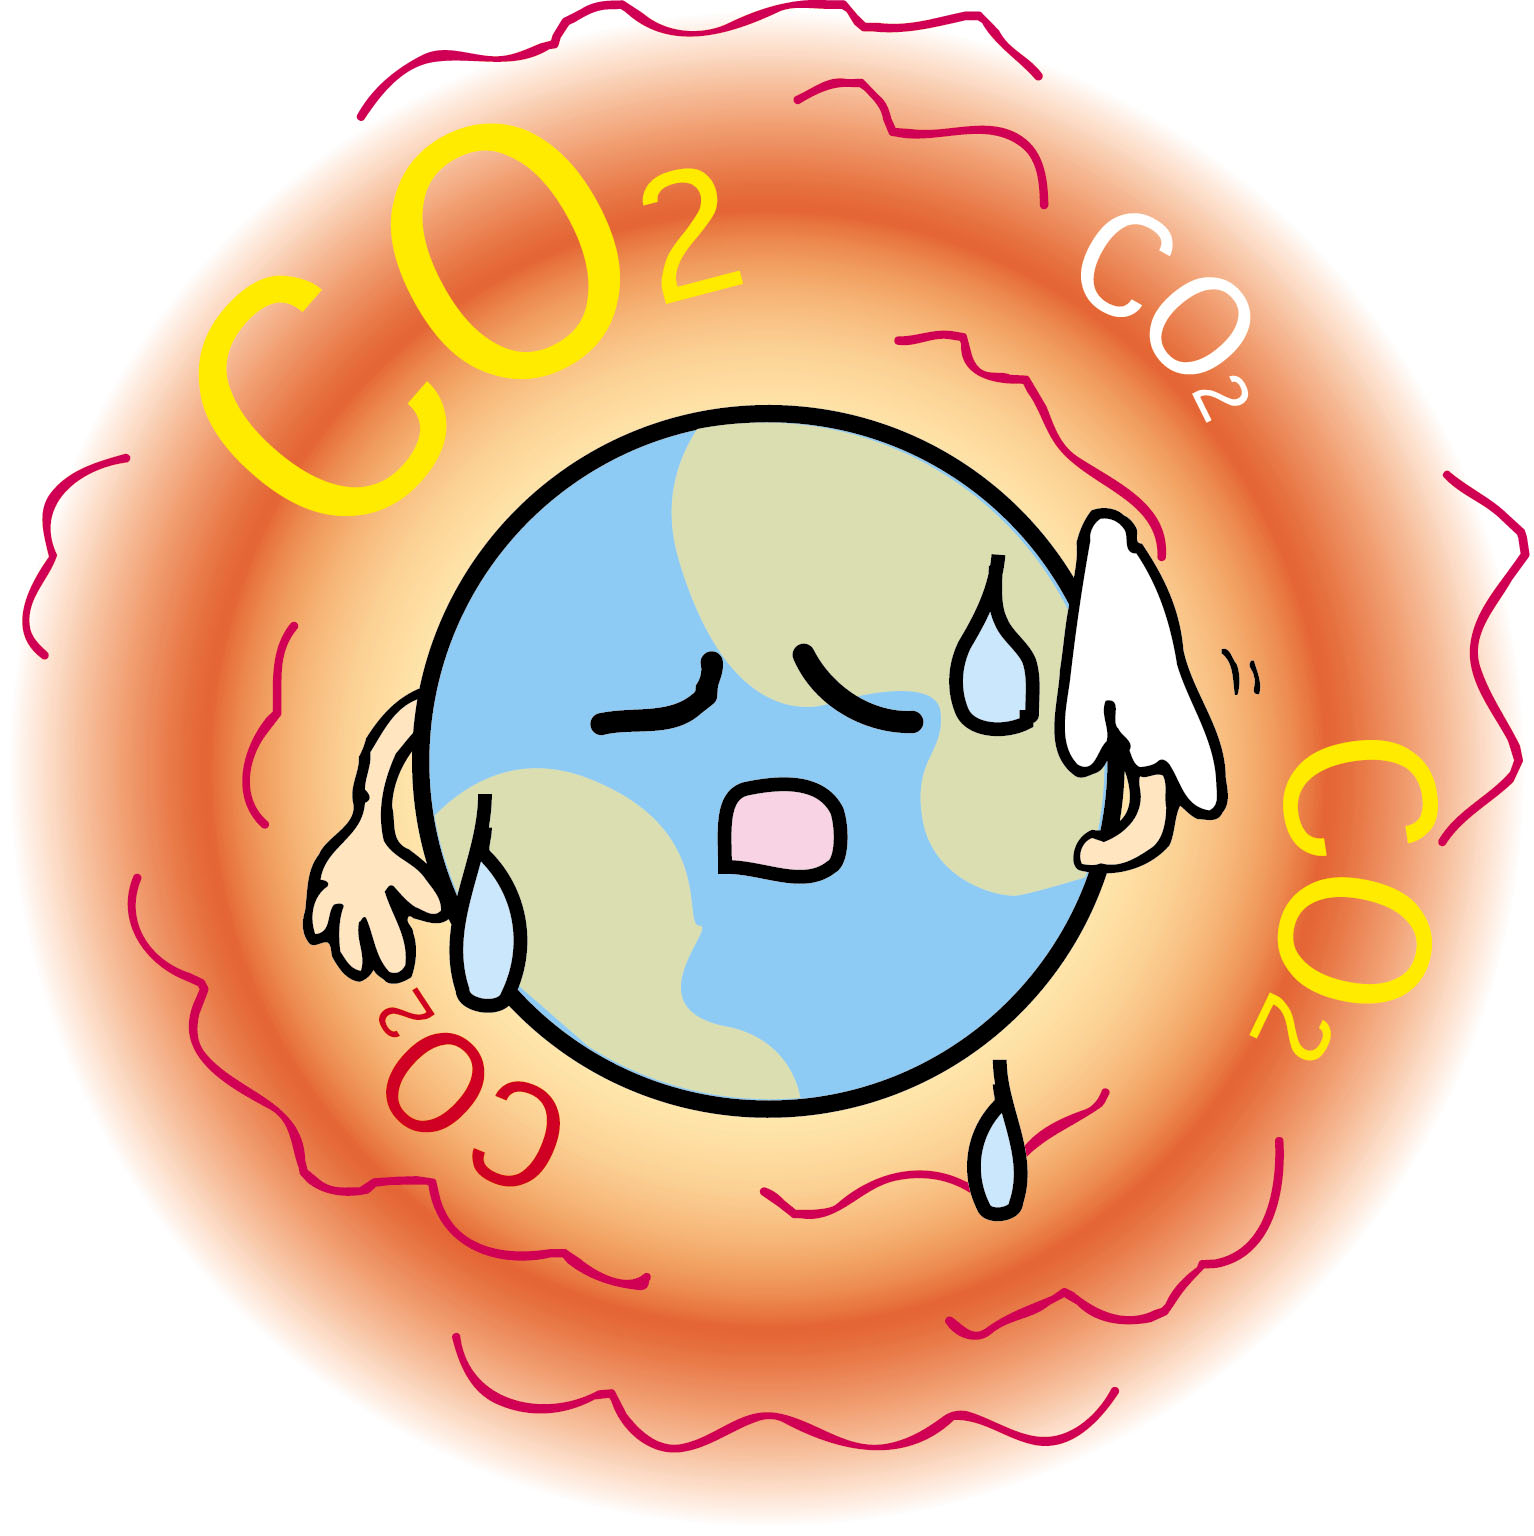 Global Warming Clip Art : 時間 グラフ : すべての講義